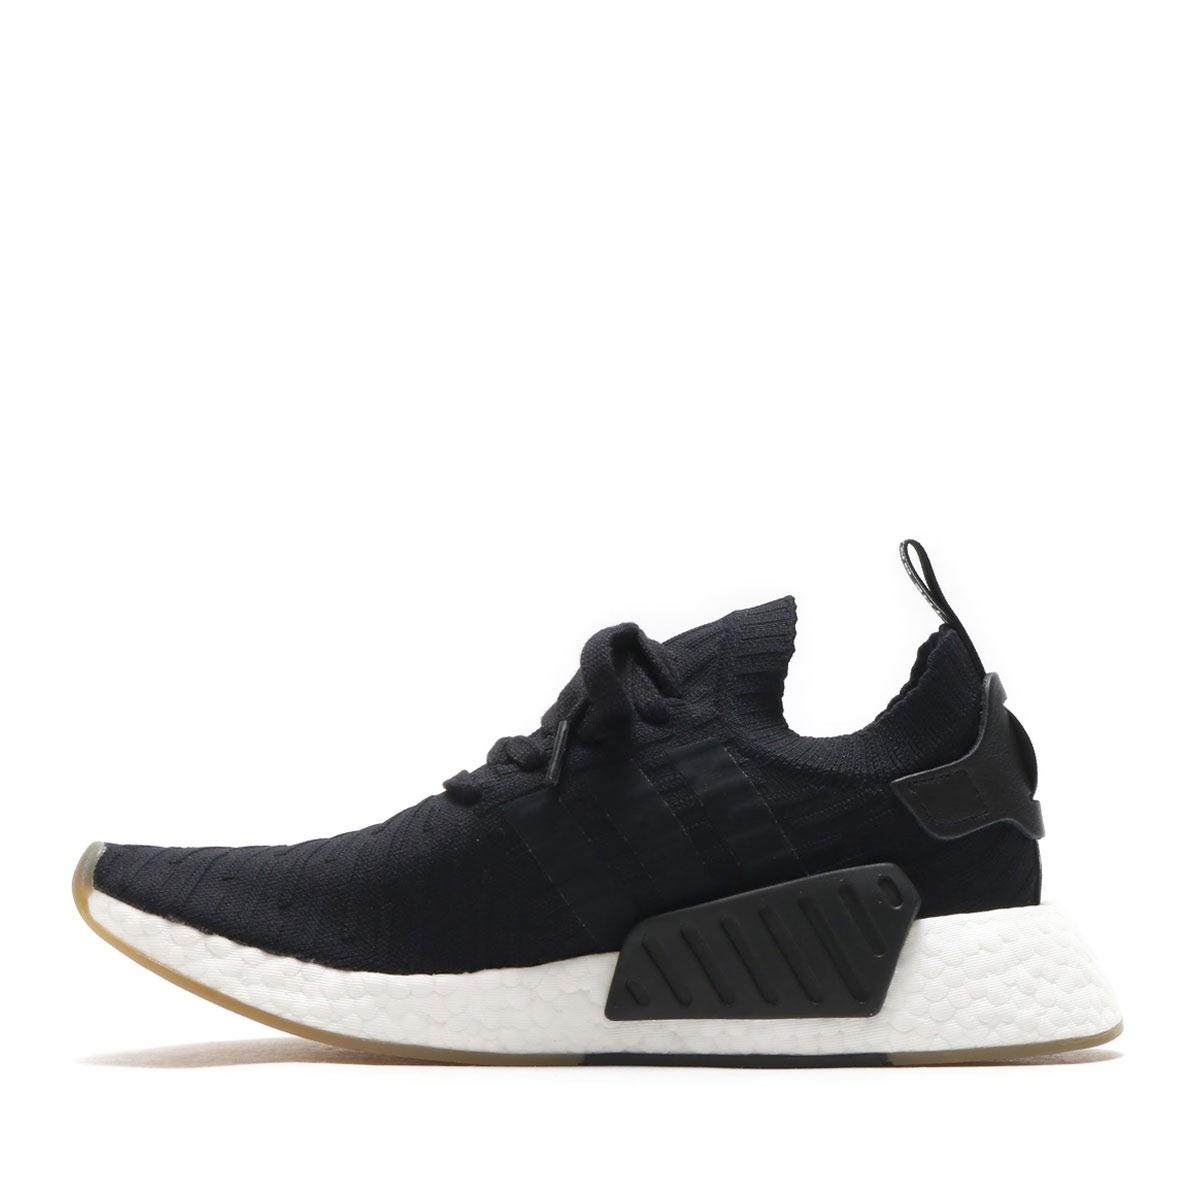 adidas Originals NMD R2 PK (Adidas originals nomad) (CORE BLACKCORE BLACK) 17FW I